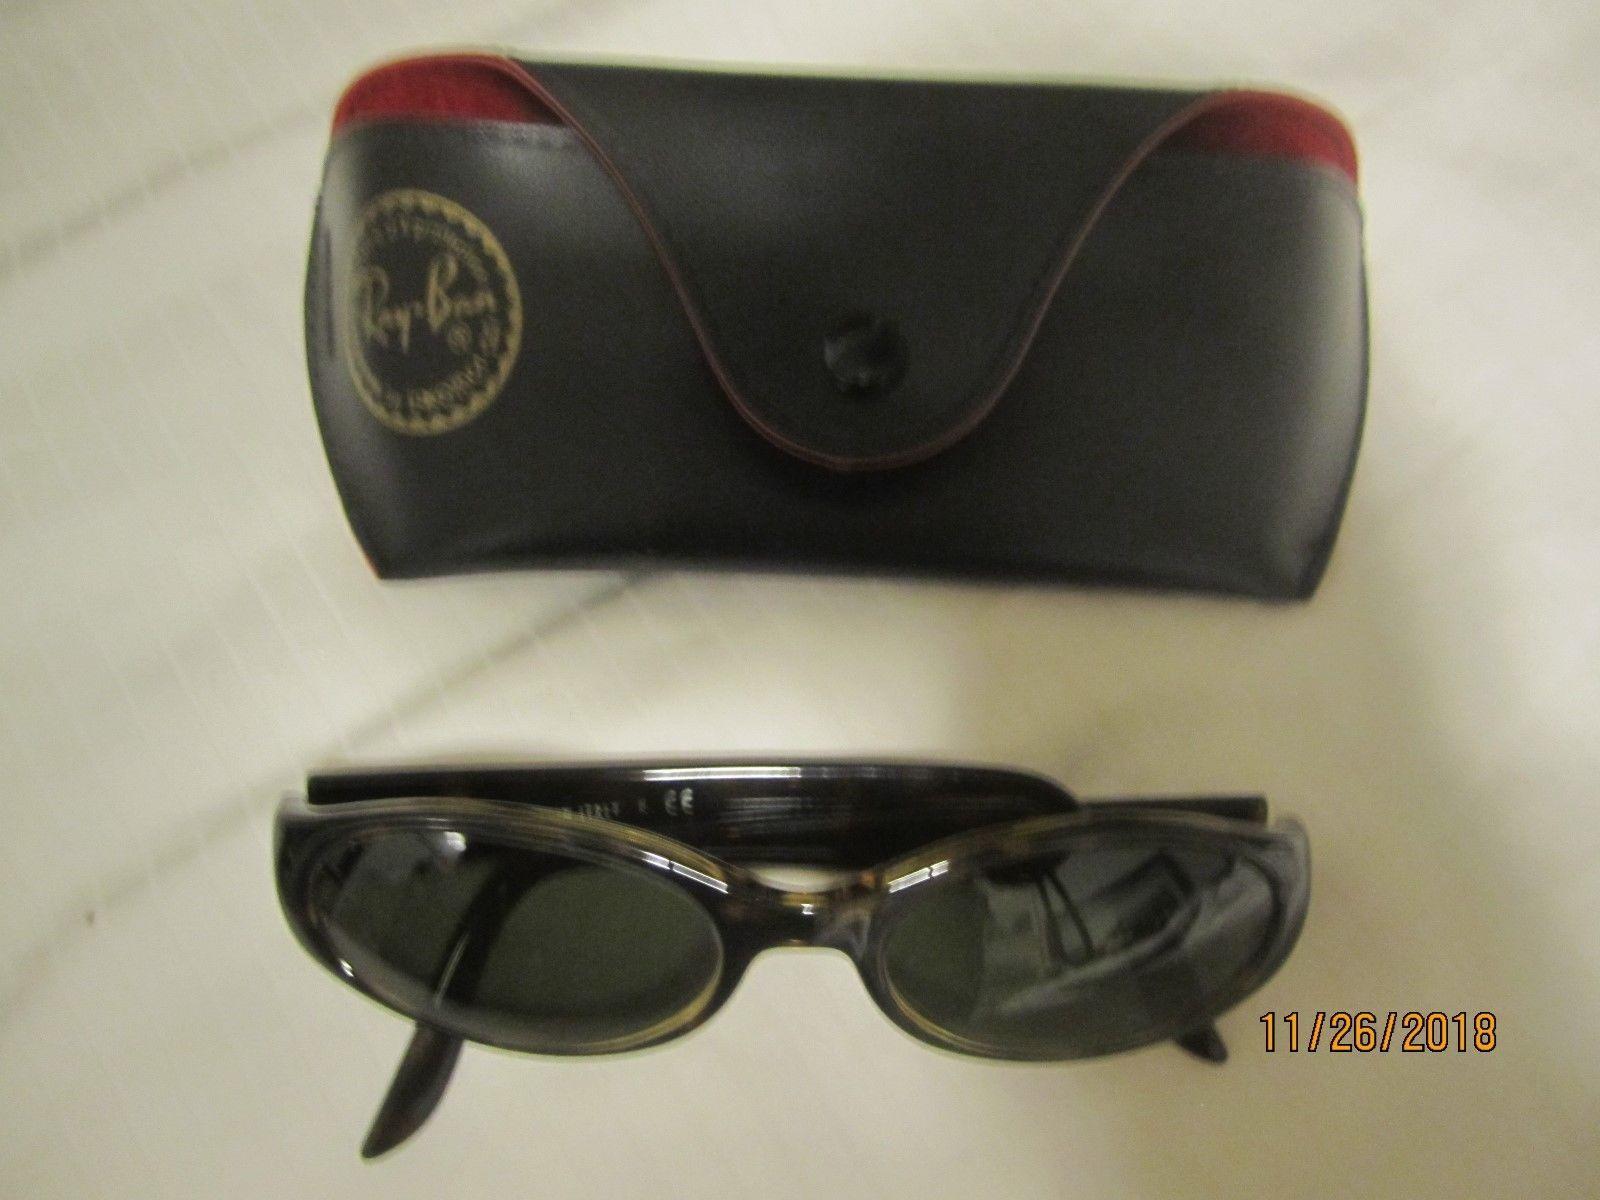 65d406273ad798 Ray Ban Sunglasses RB2128 Tortoiseshell and 32 similar items